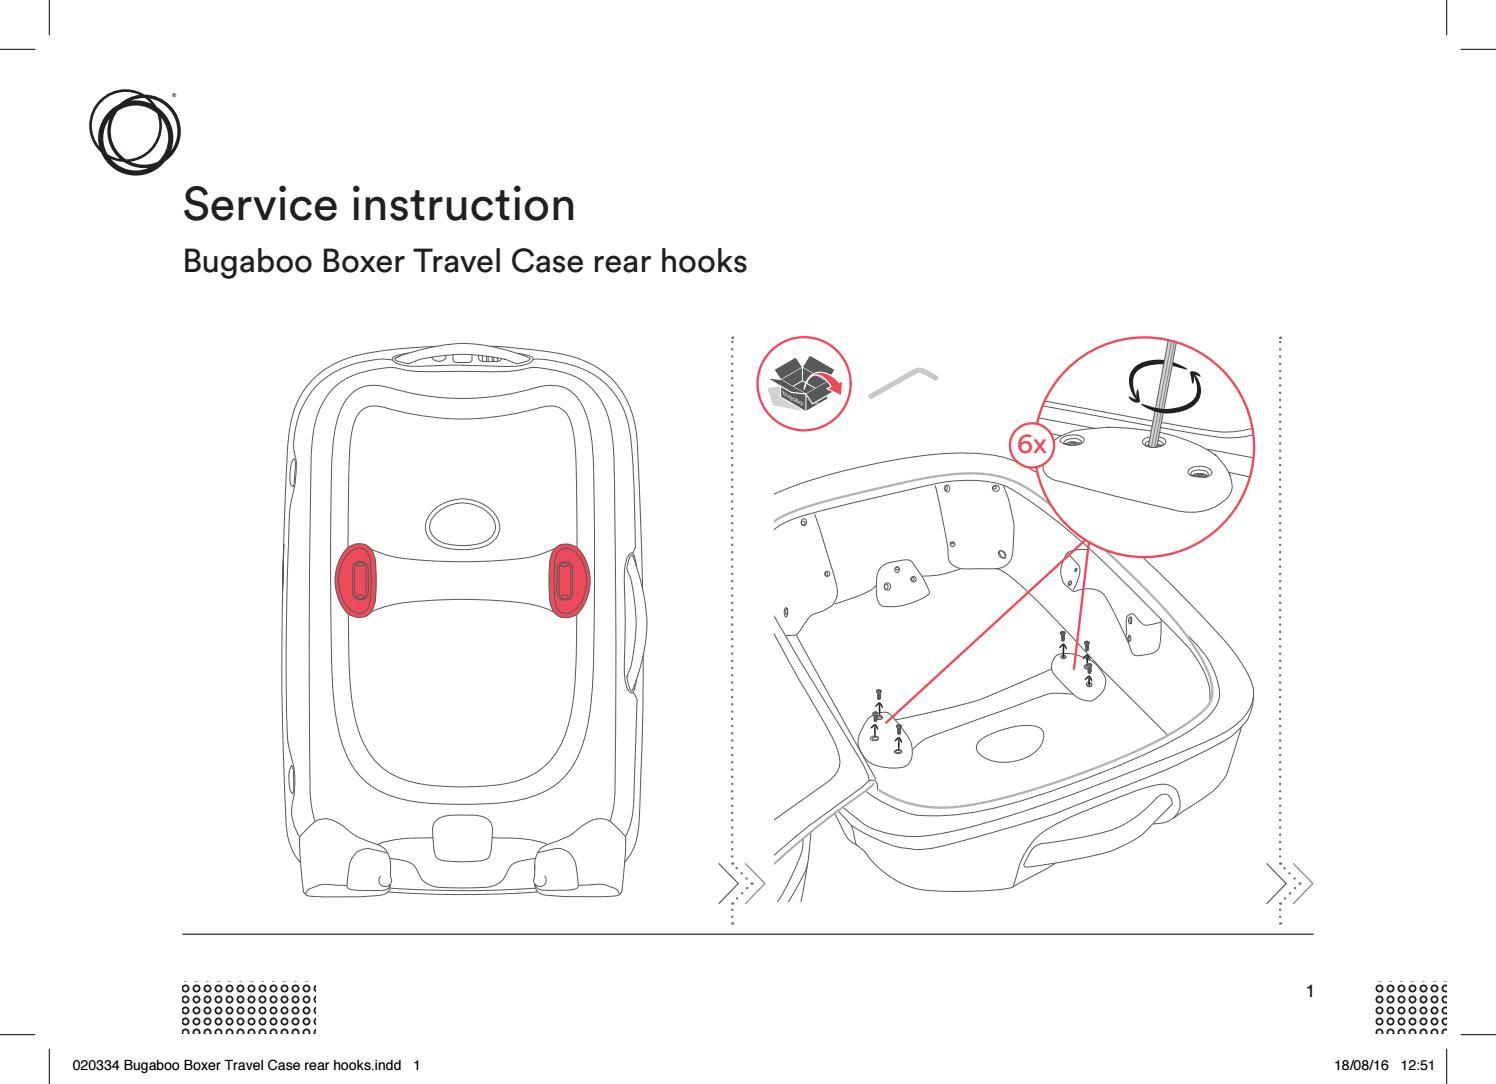 bugaboo boxer travel case rear hooks service instructions